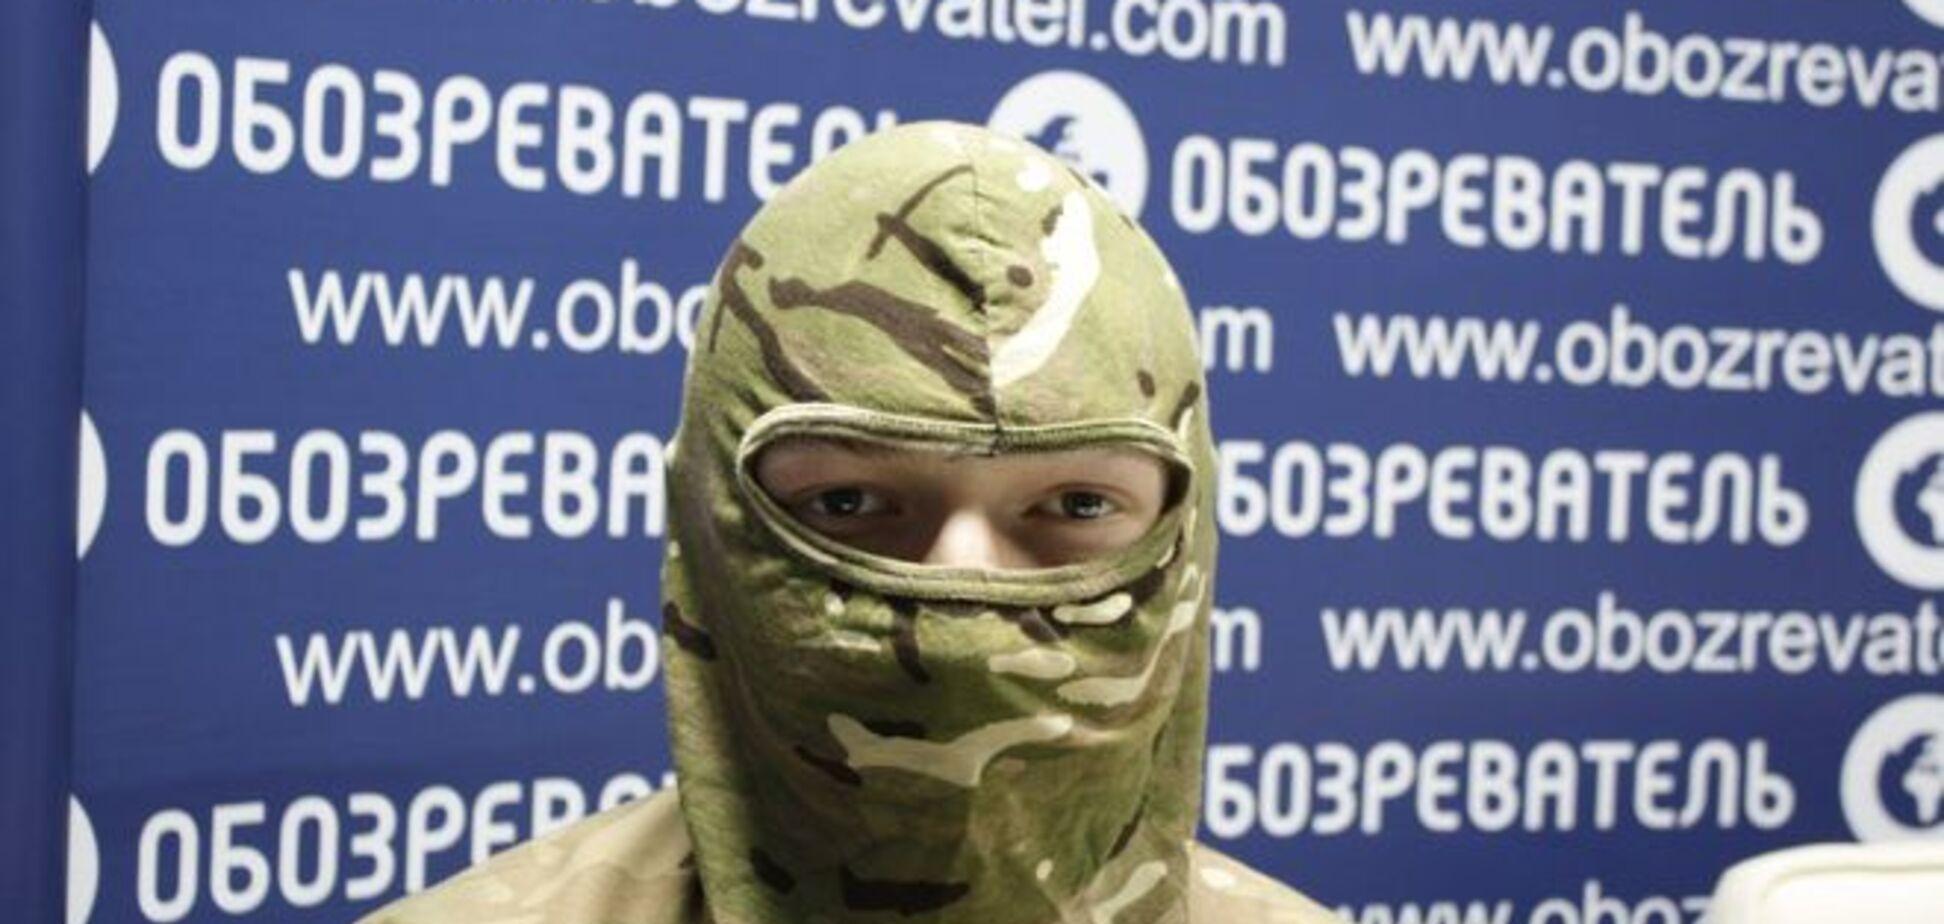 Доброволец-'правосек' из Беларуси: я не могу вернуться домой, на вокзале возьмут КГБшники